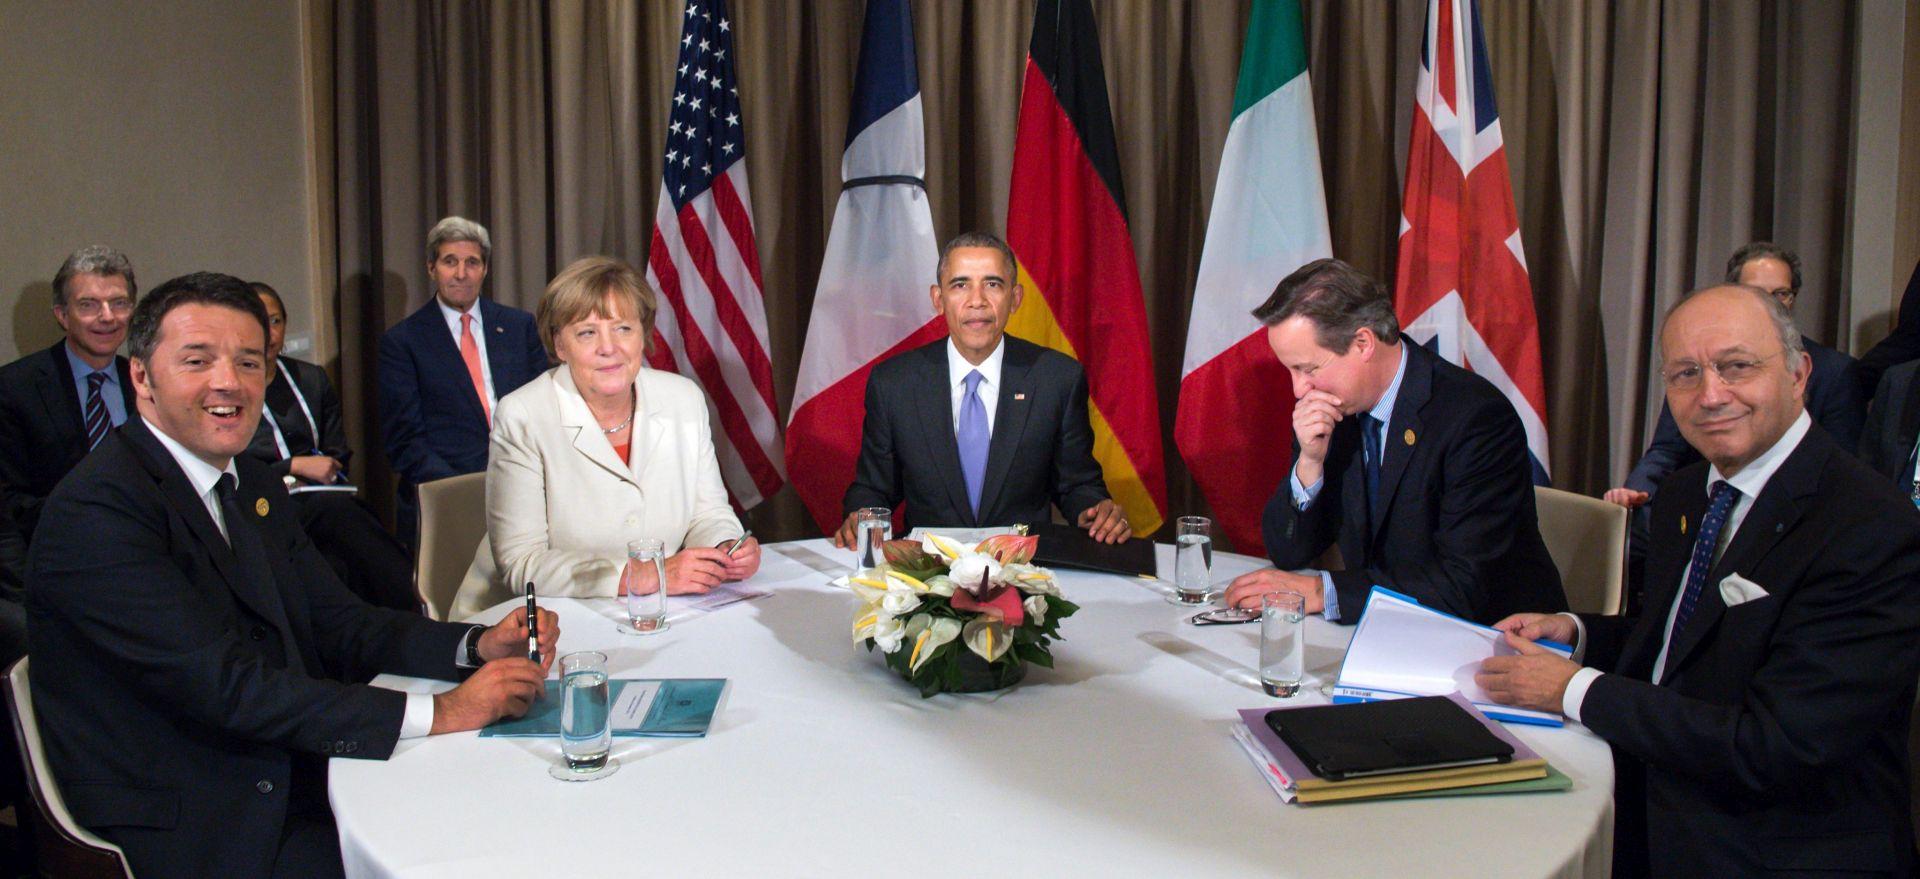 Glavni zaključci summita G20 u Antalyi